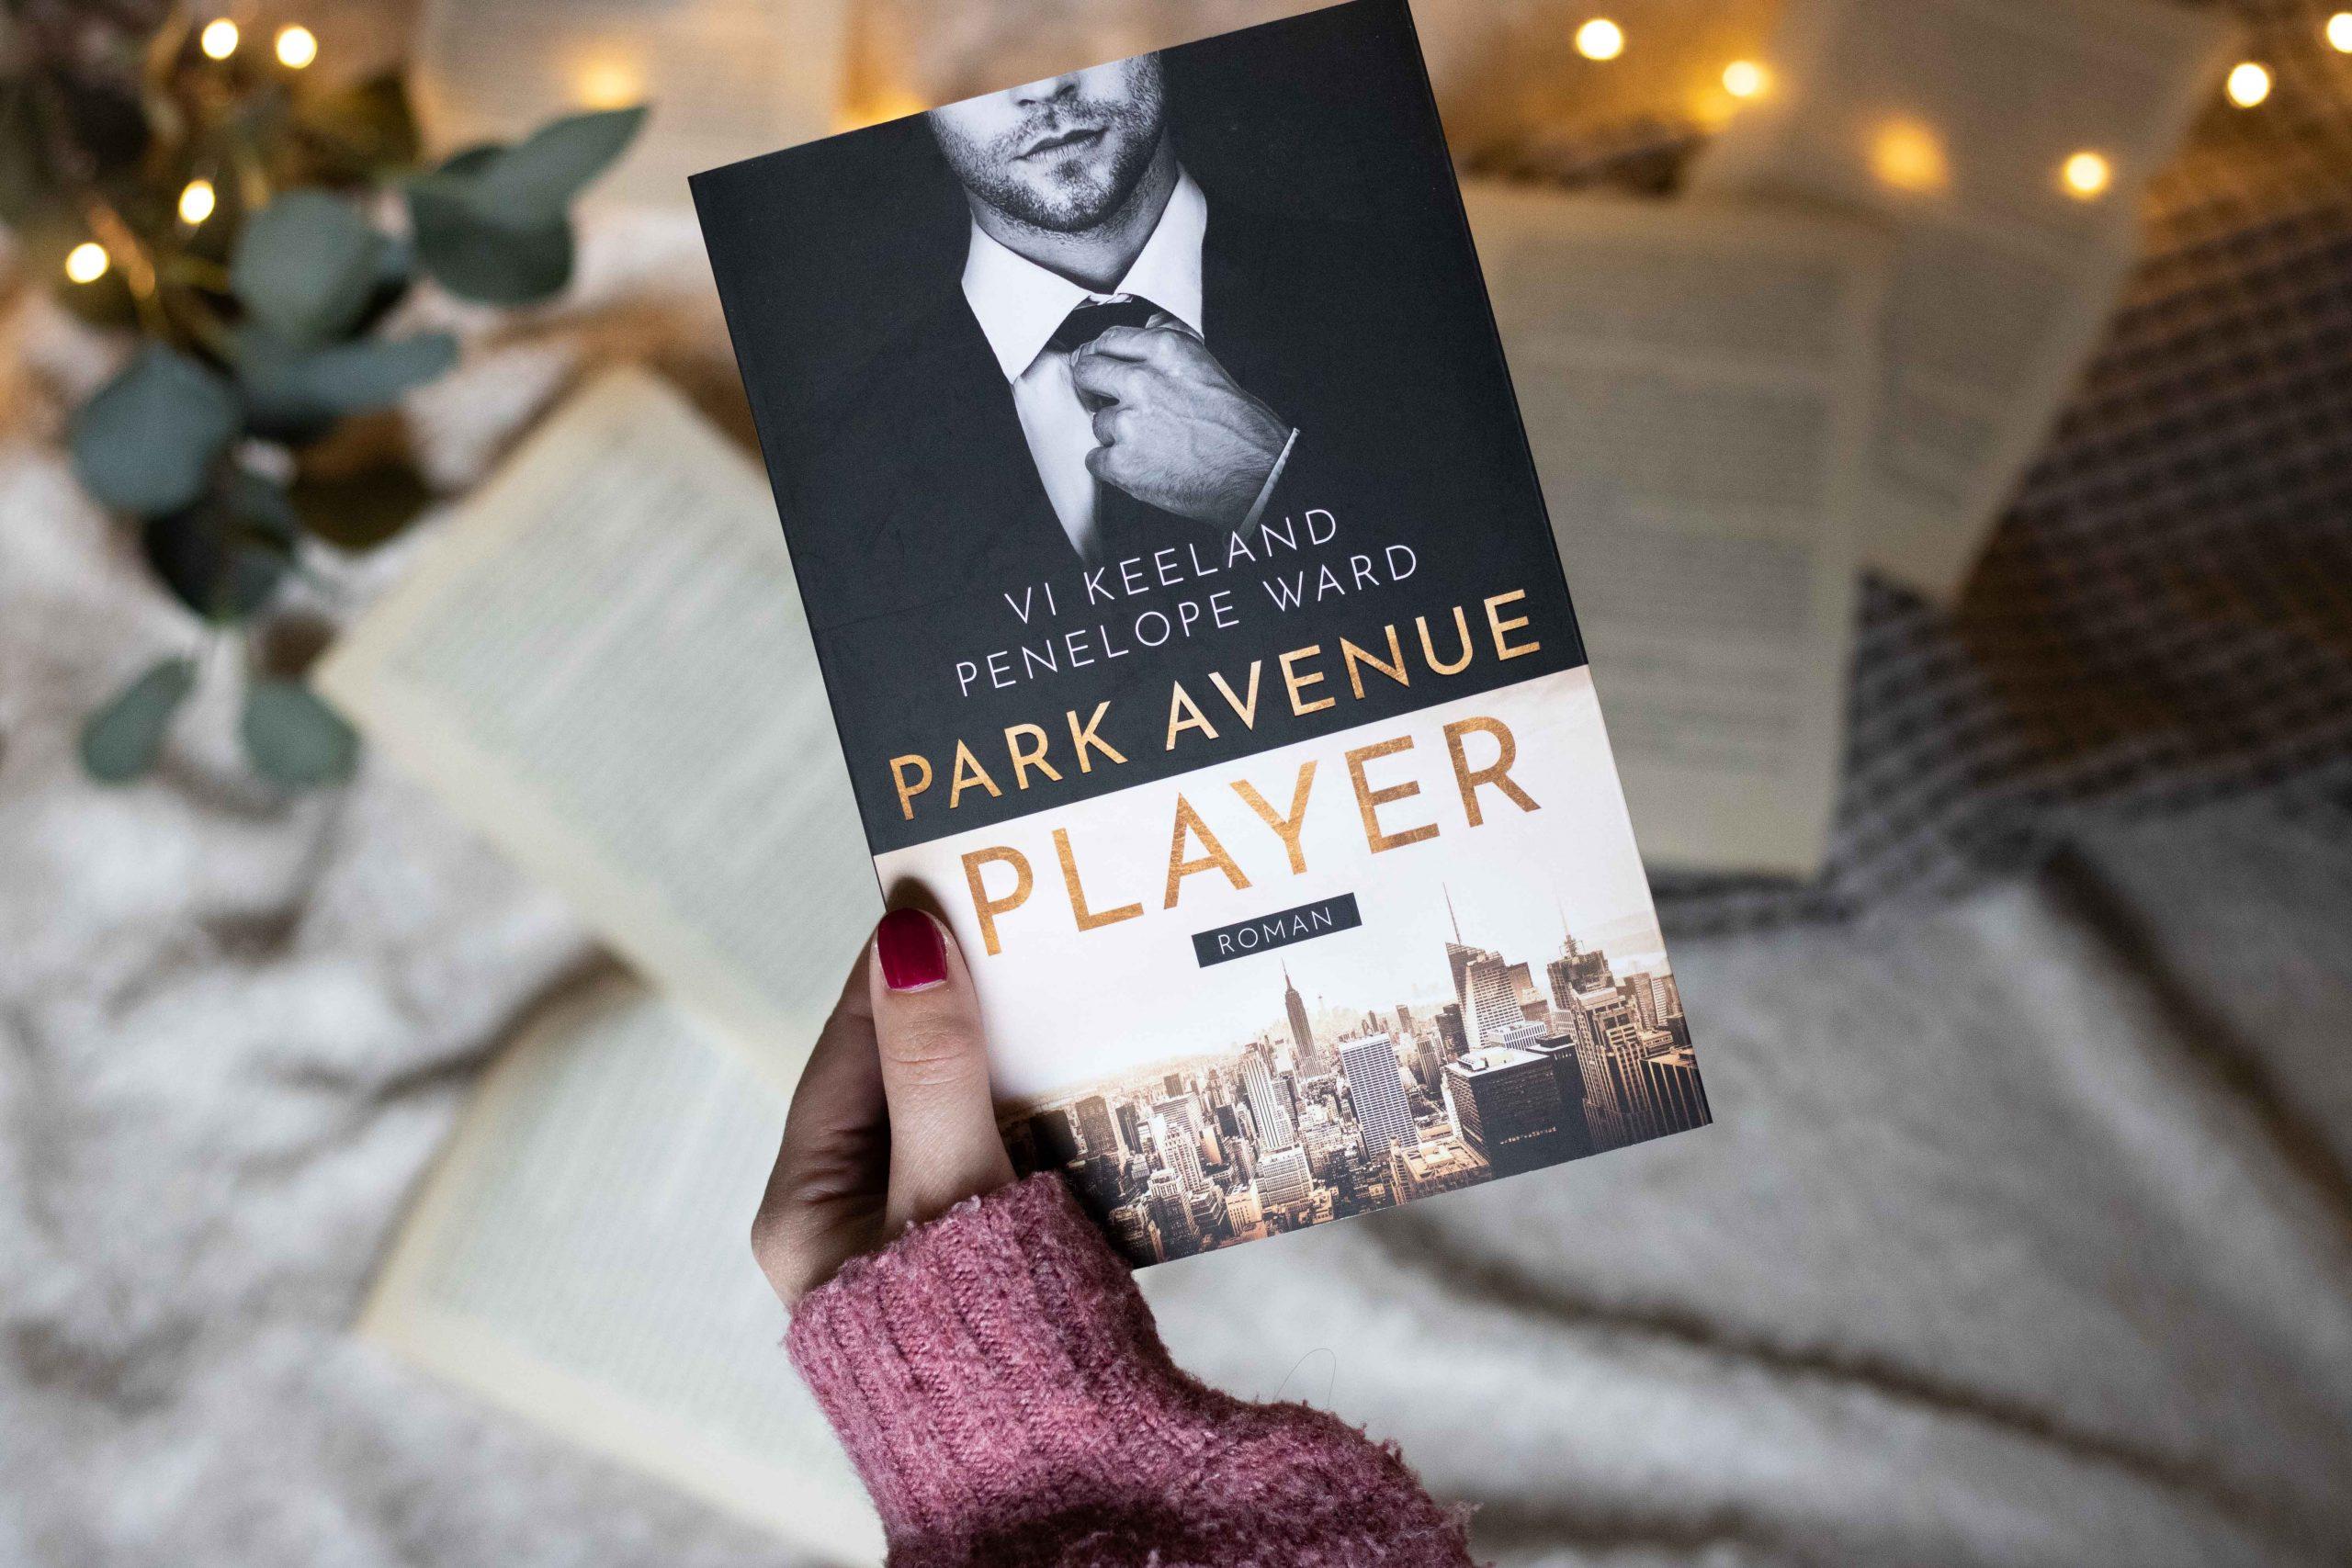 Park Avenue Player | Vi Keeland & Penelope Ward